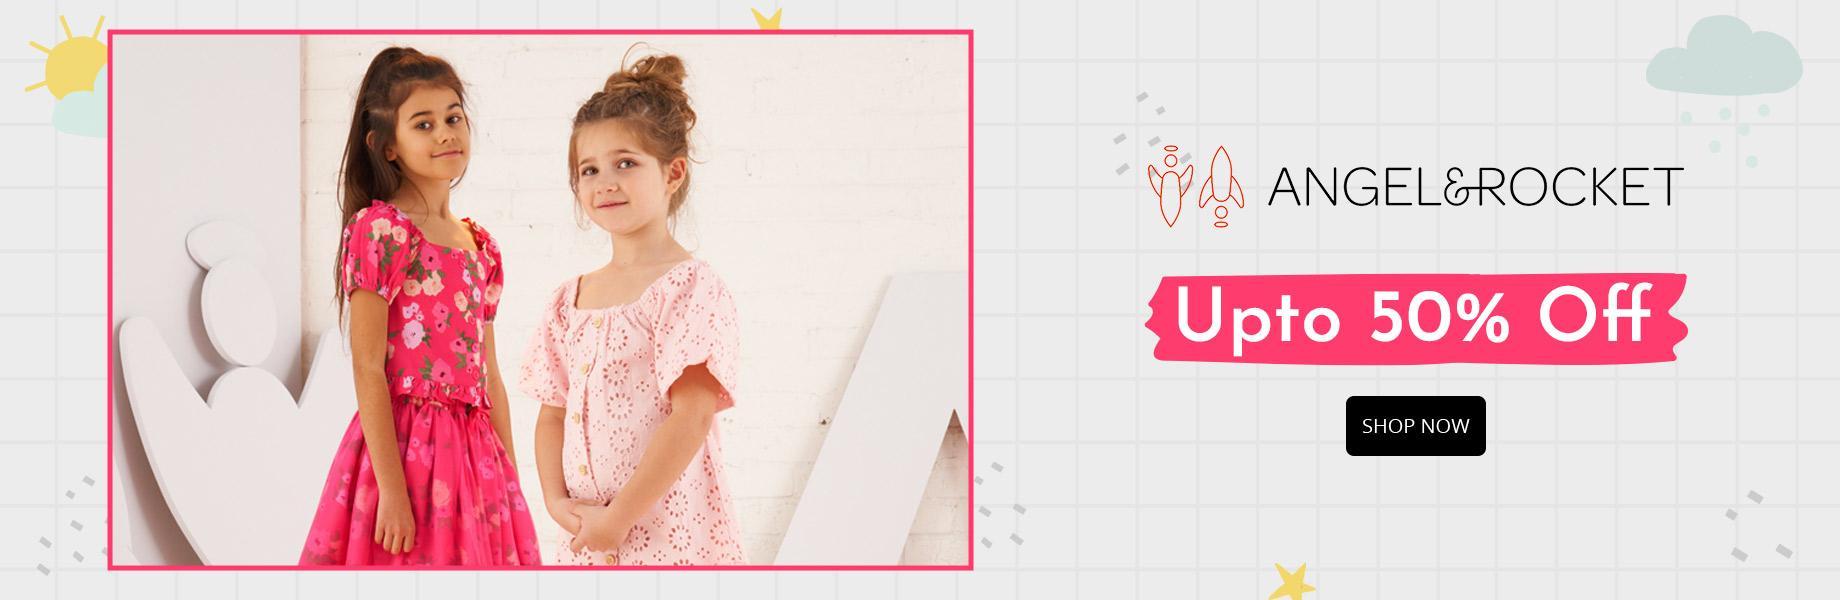 Kids-Page-Iconic-Brands-Static-Angel-Rocket-Web.jpg